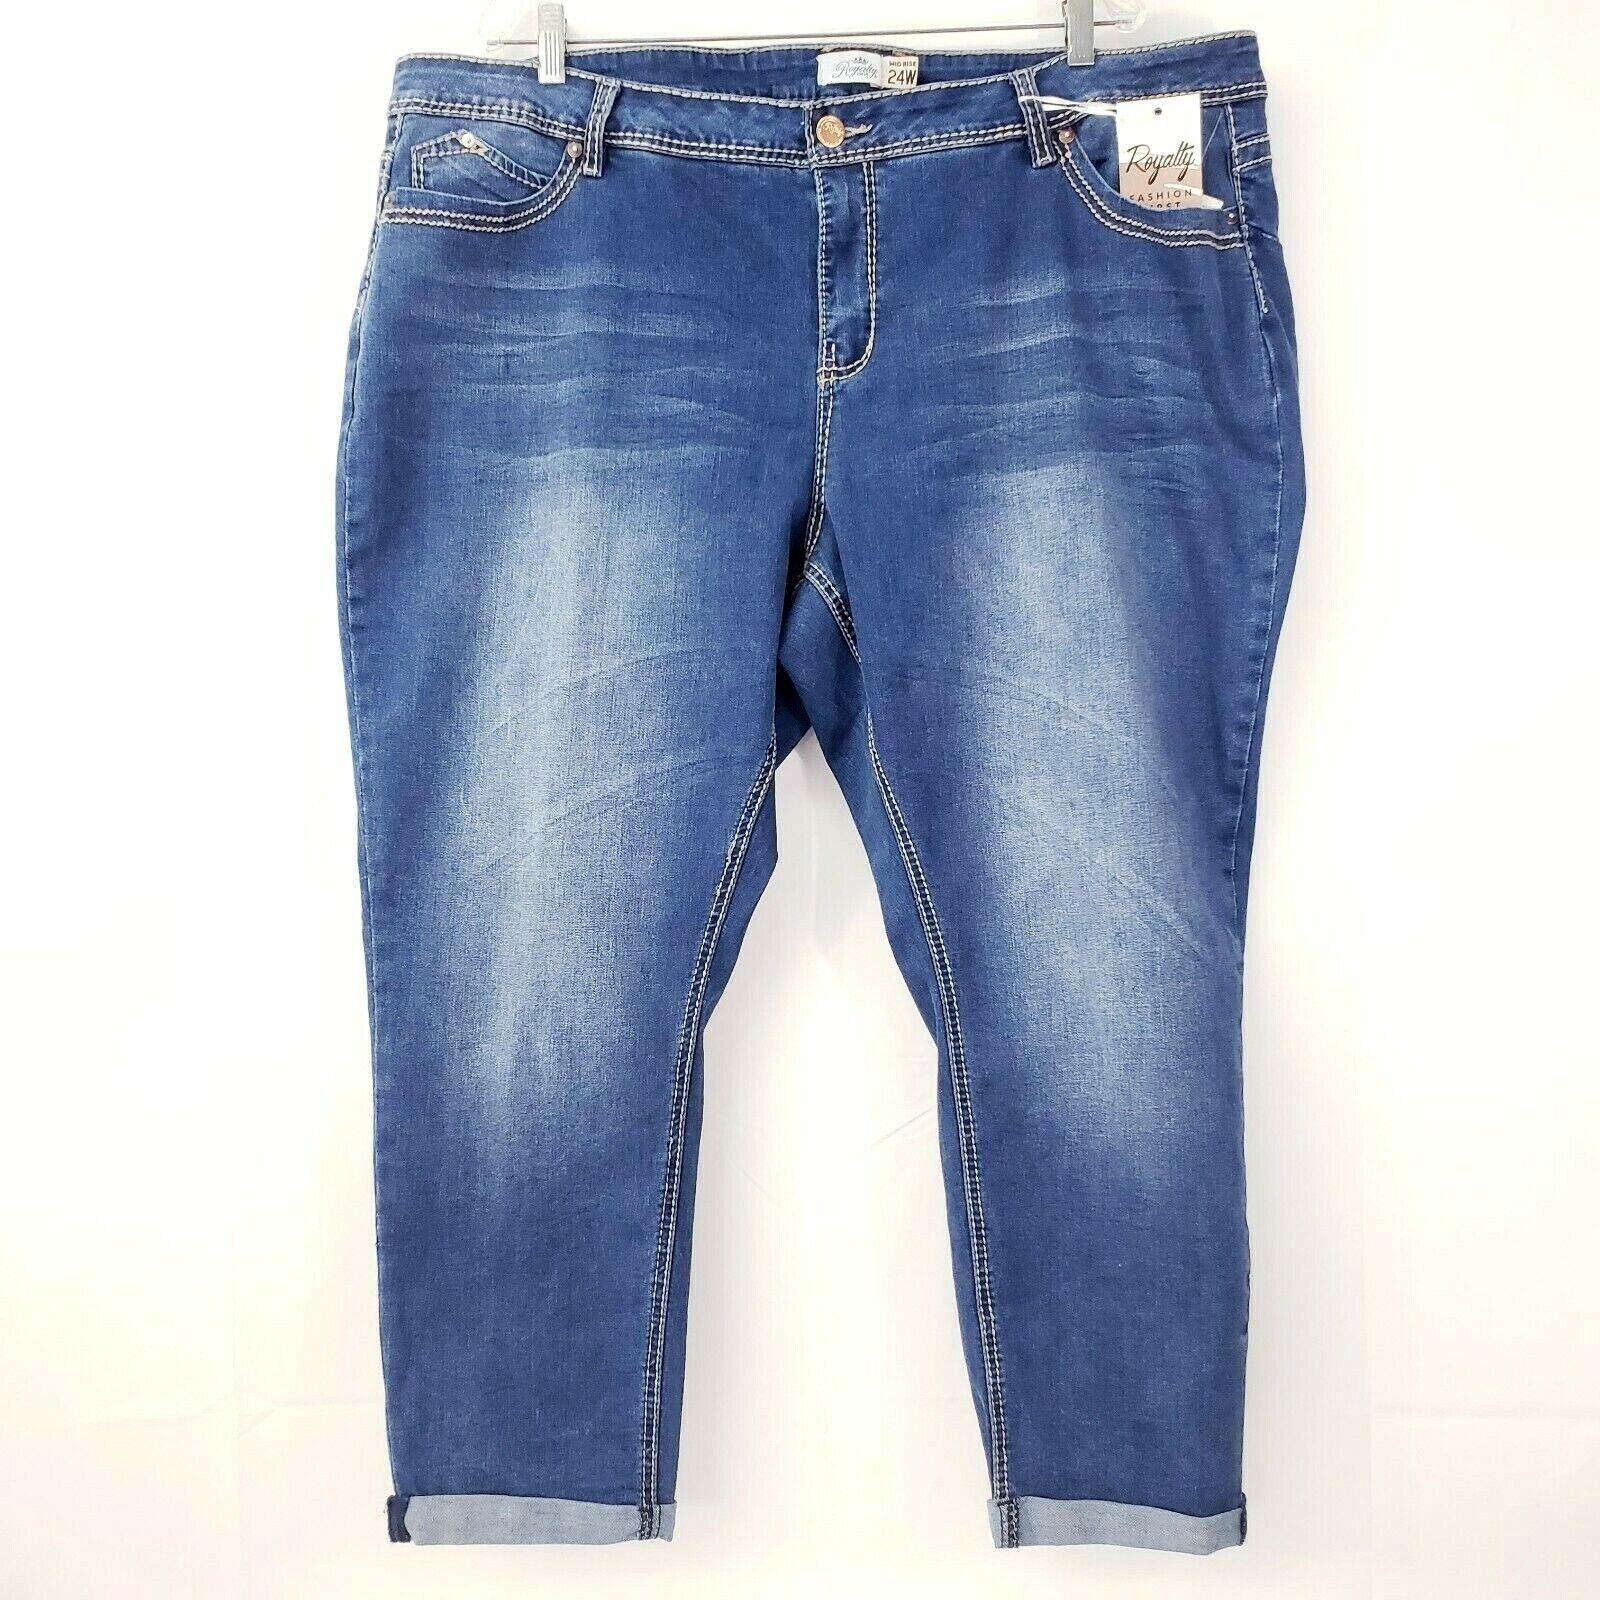 Royalty Women's Capri Jeans Plus Sz 24W Stretch Mid Rise bluee Medium Wash